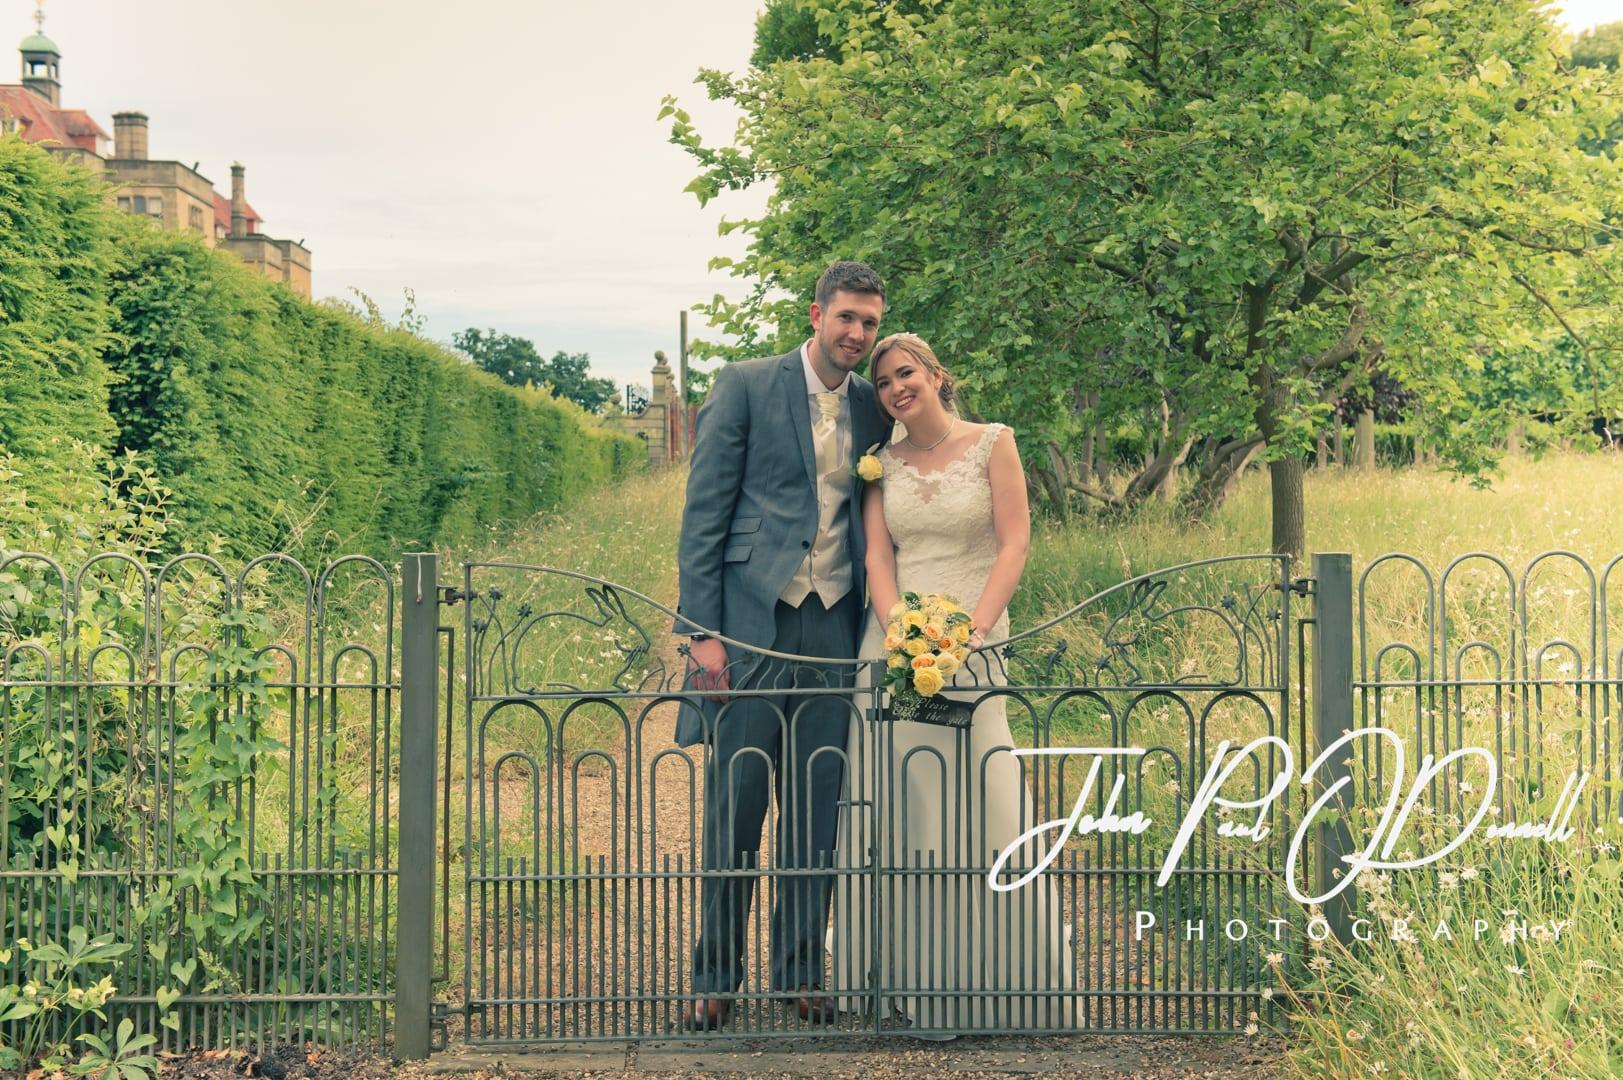 Katherine and Marks wedding at Fanhams Hall Herts